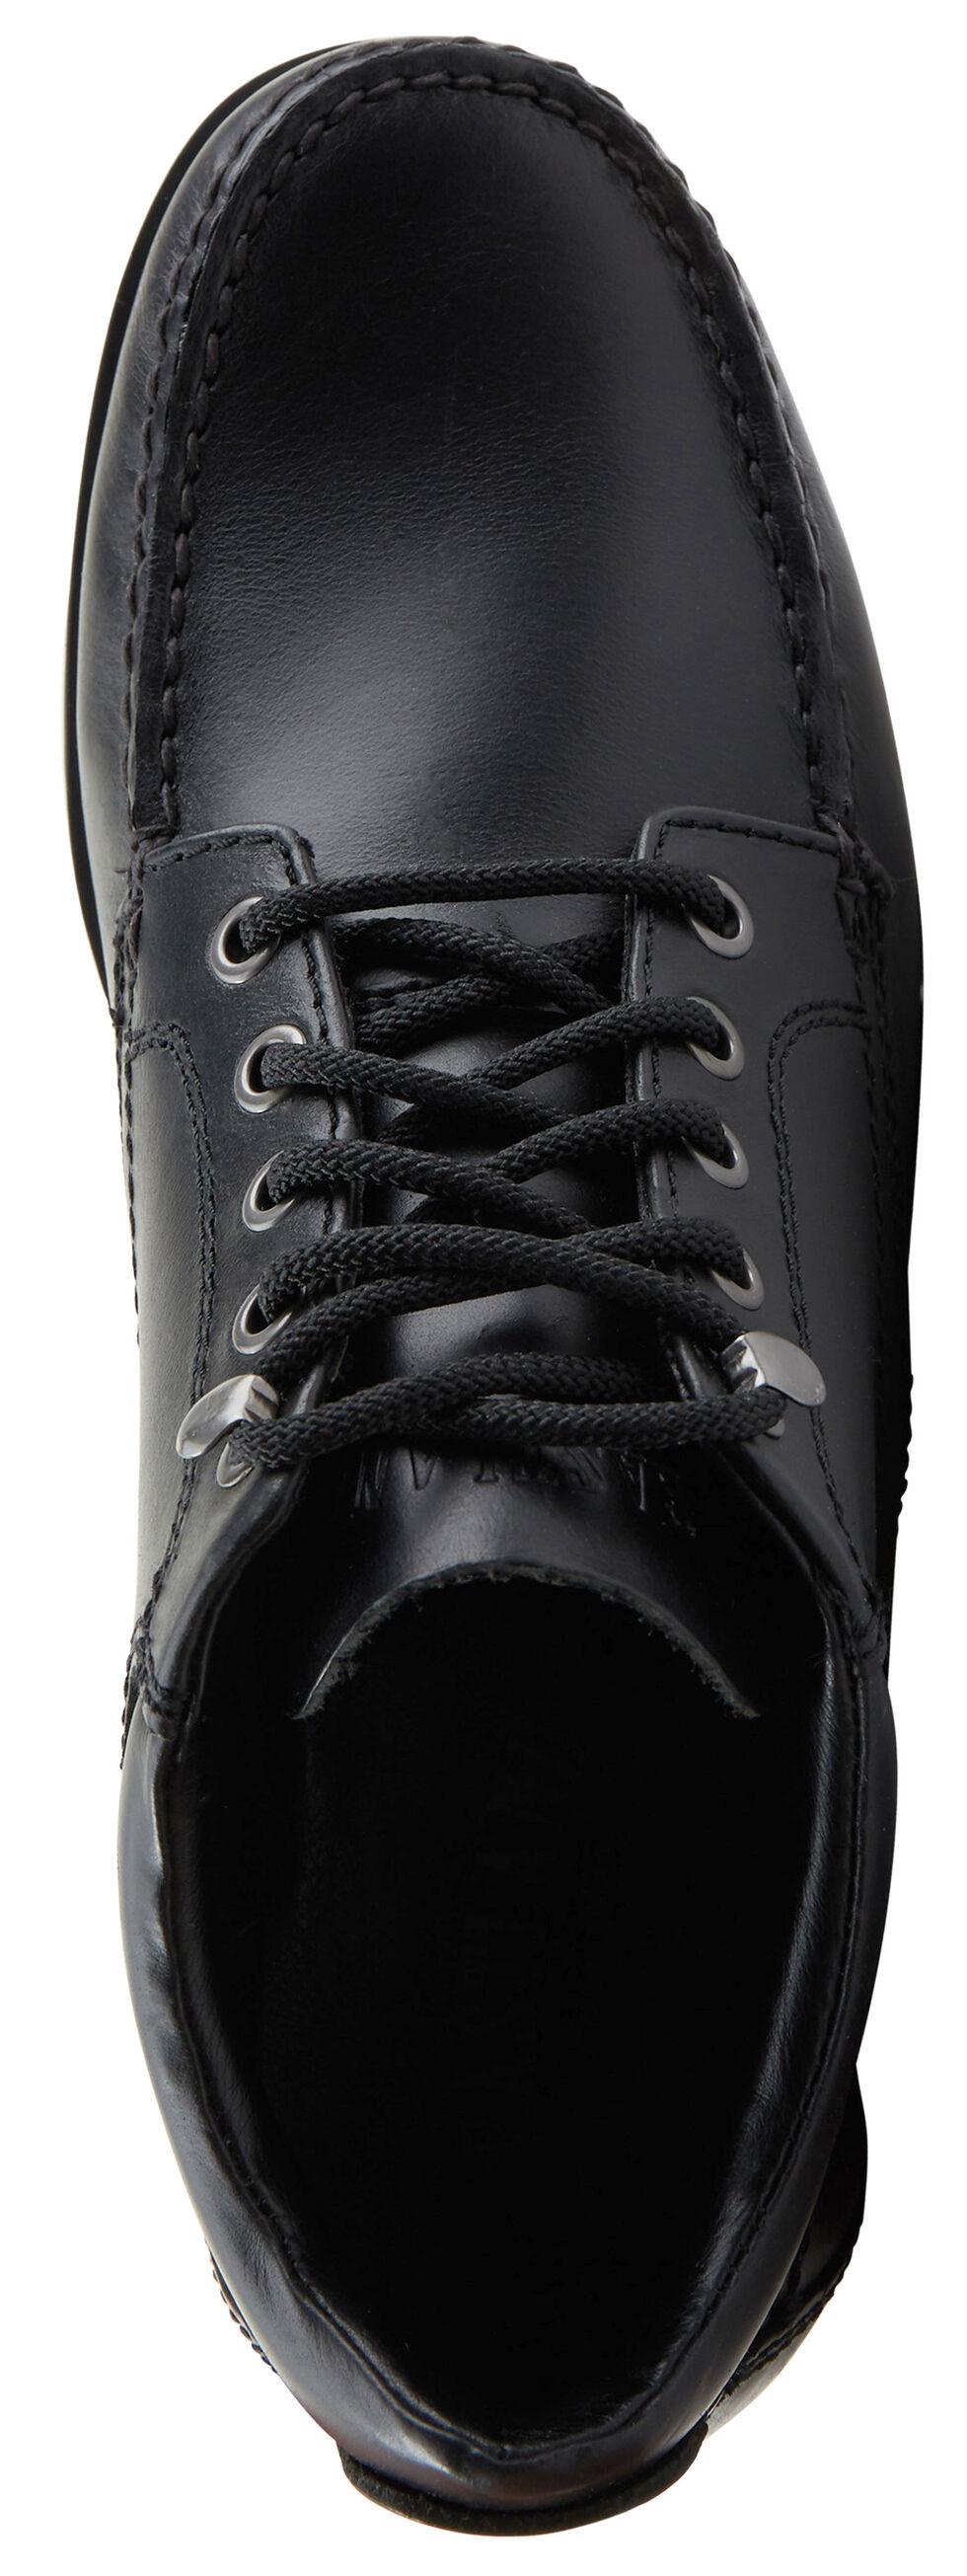 Eastland Men's Black Brooklyn Ankle Boots , Black, hi-res